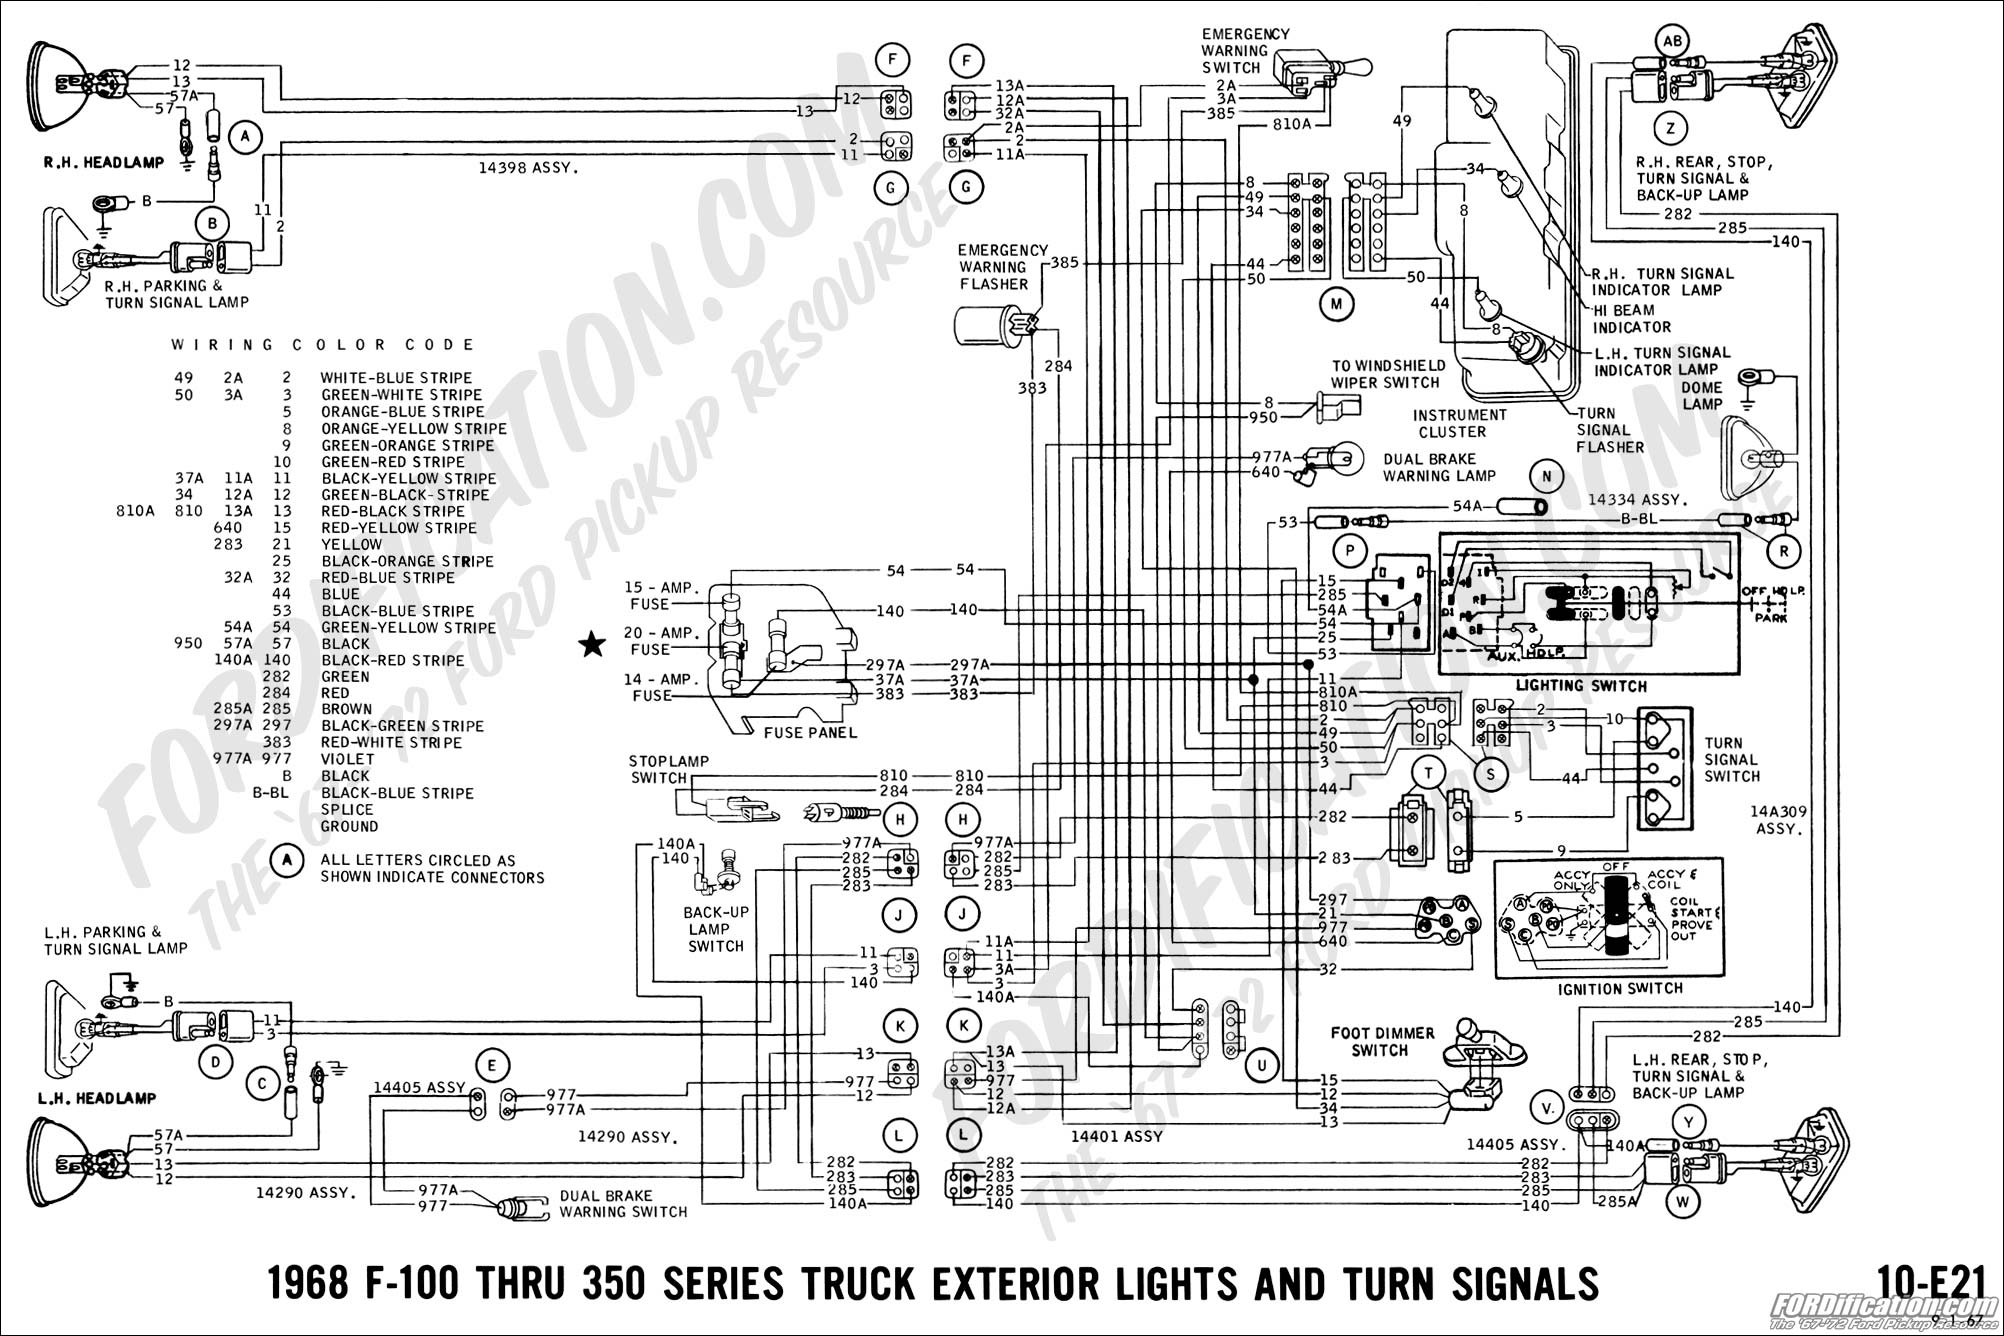 wiring diagram 1965 ford galaxie wiring diagram plymouth wiring